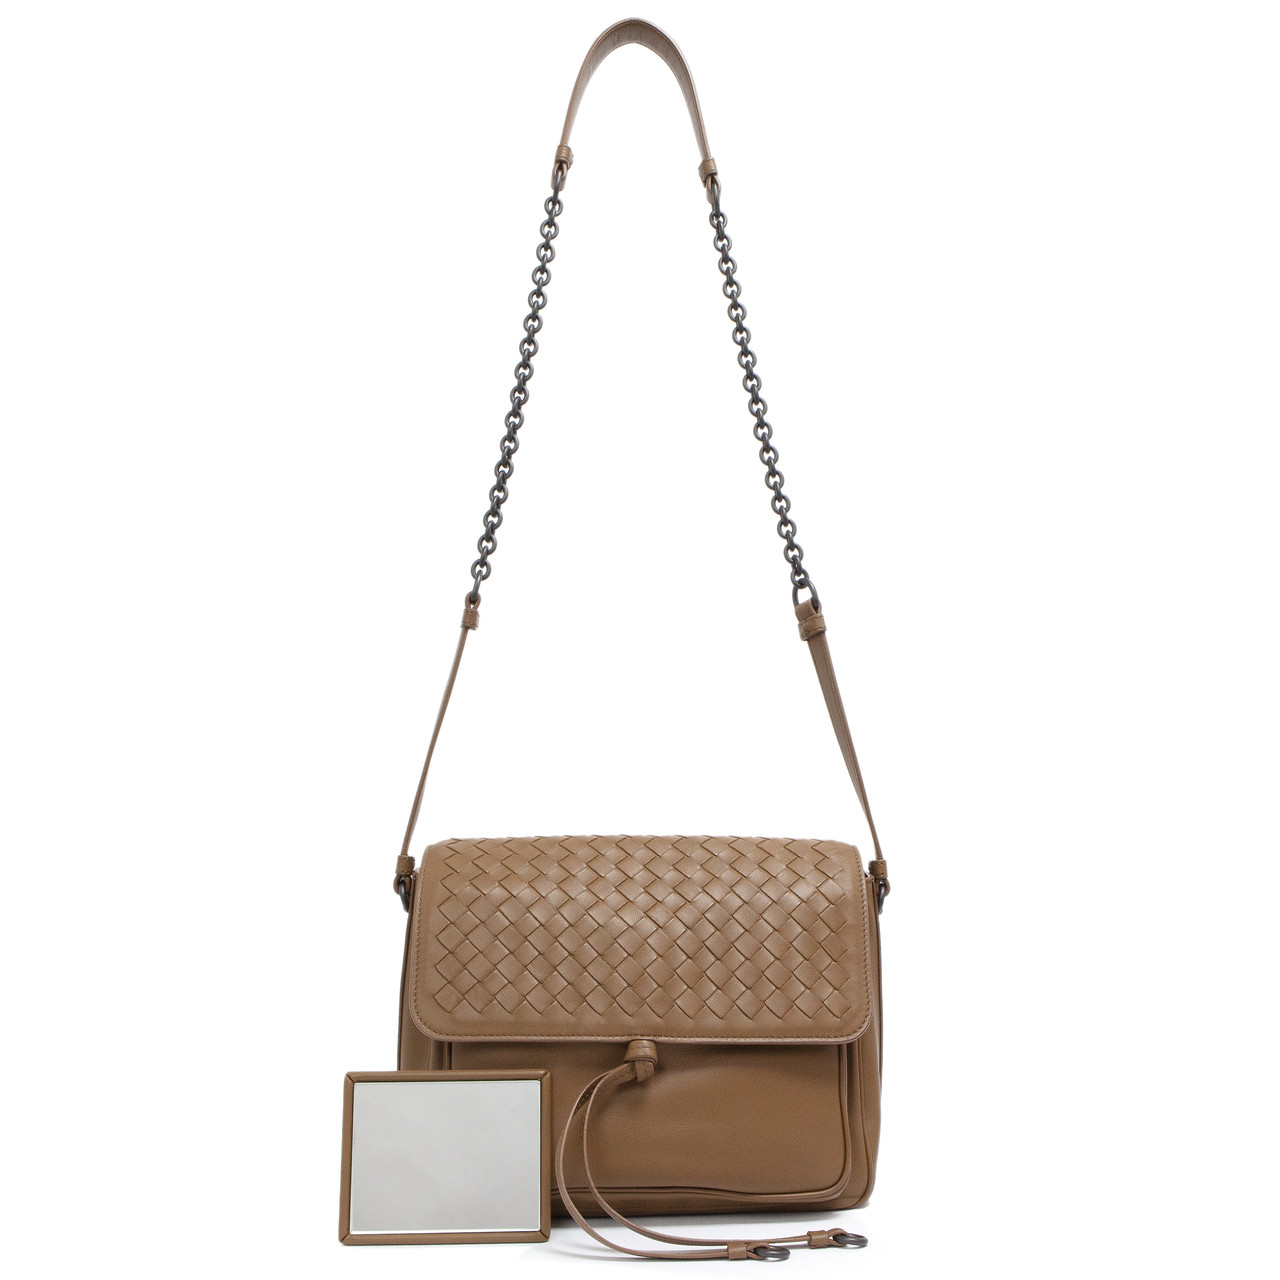 bc8566216423 Bottega Veneta Brown Intrecciato Tie Saddle Shoulder Bag - modaselle